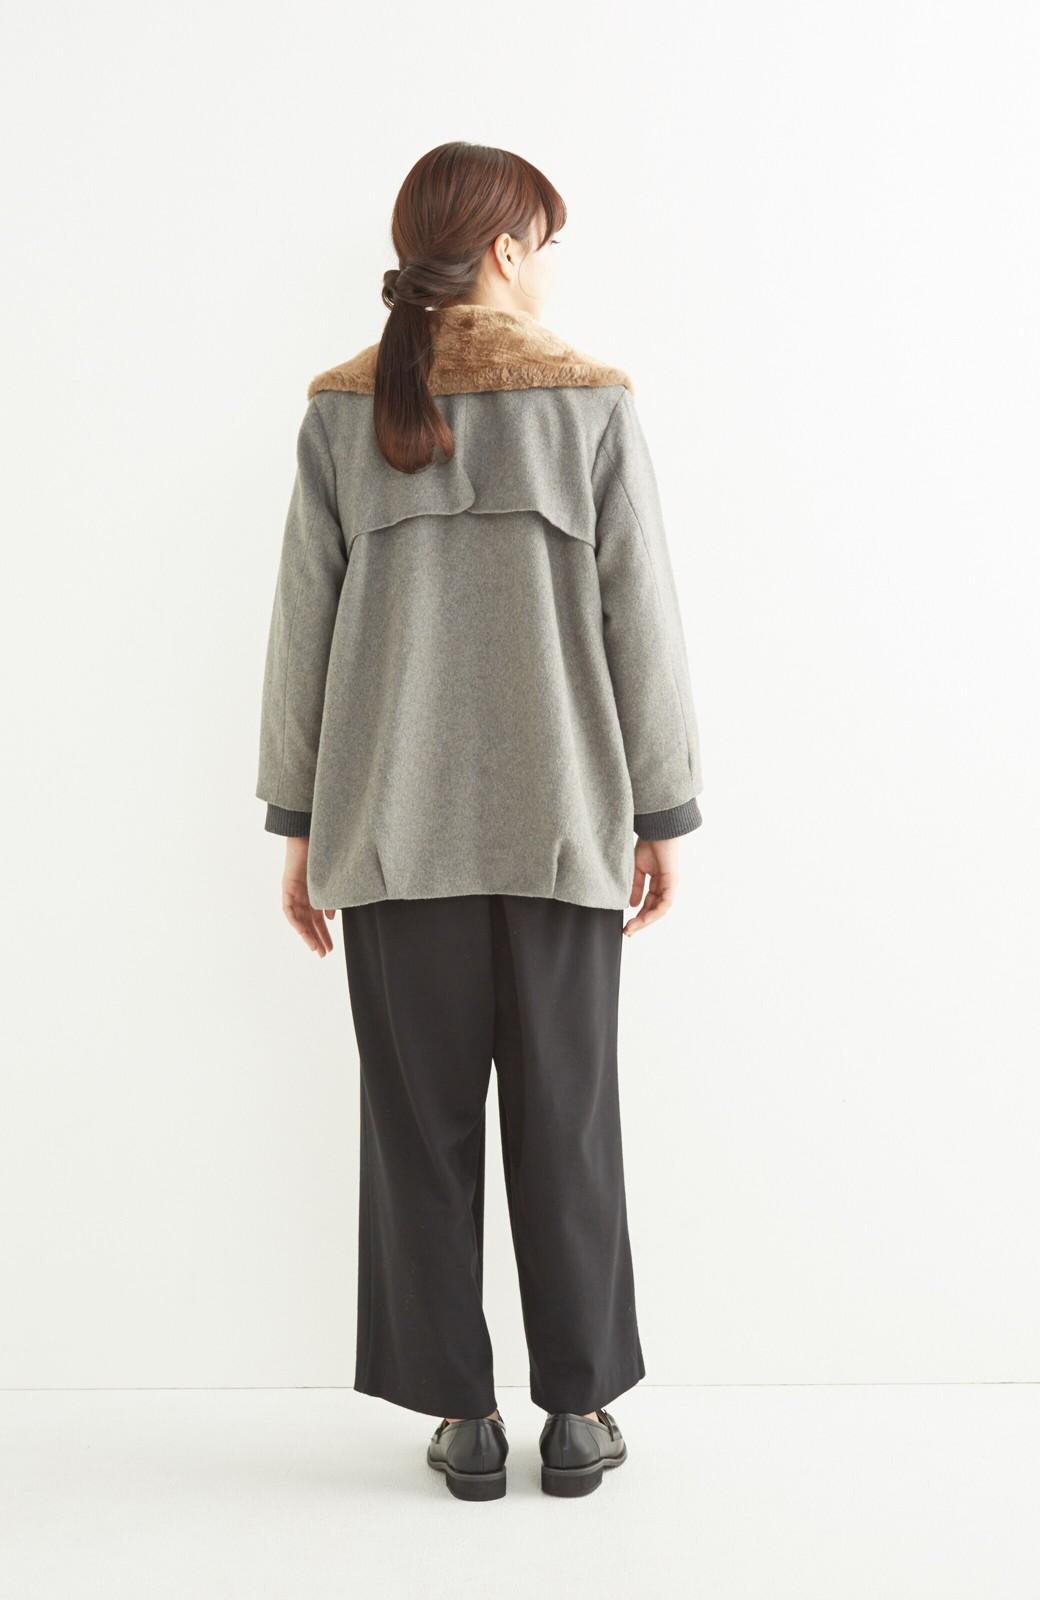 pilvee 取り外しフェイクファー衿付き ウール混のノーカラーコート <グレー>の商品写真11